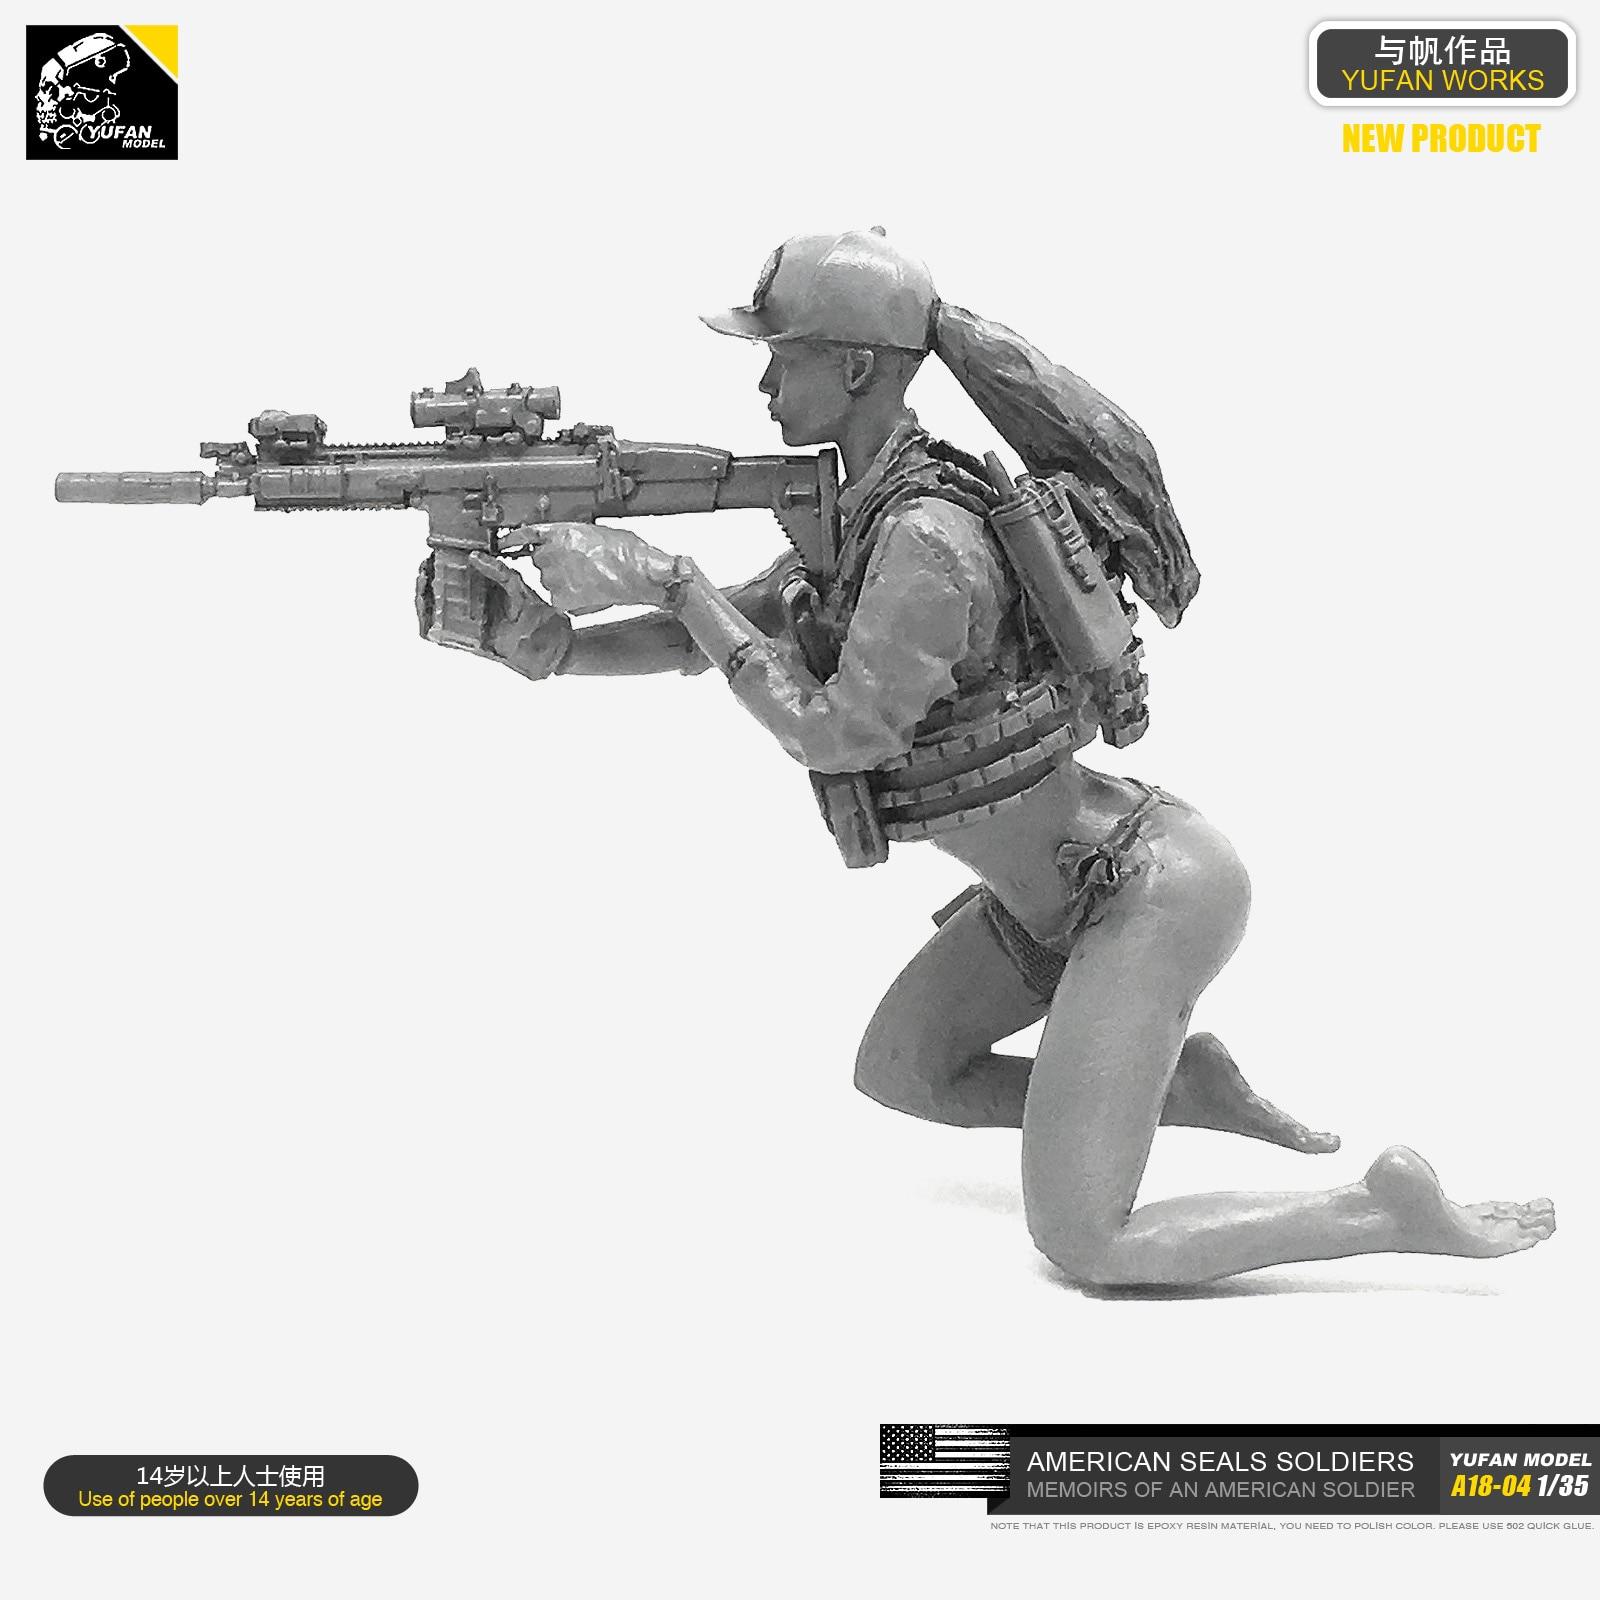 Yufan Modell 1/35 Harz Soldat Kits Modell (UNS Armee Bikini Dichtungen) selbst-montiert A18-04